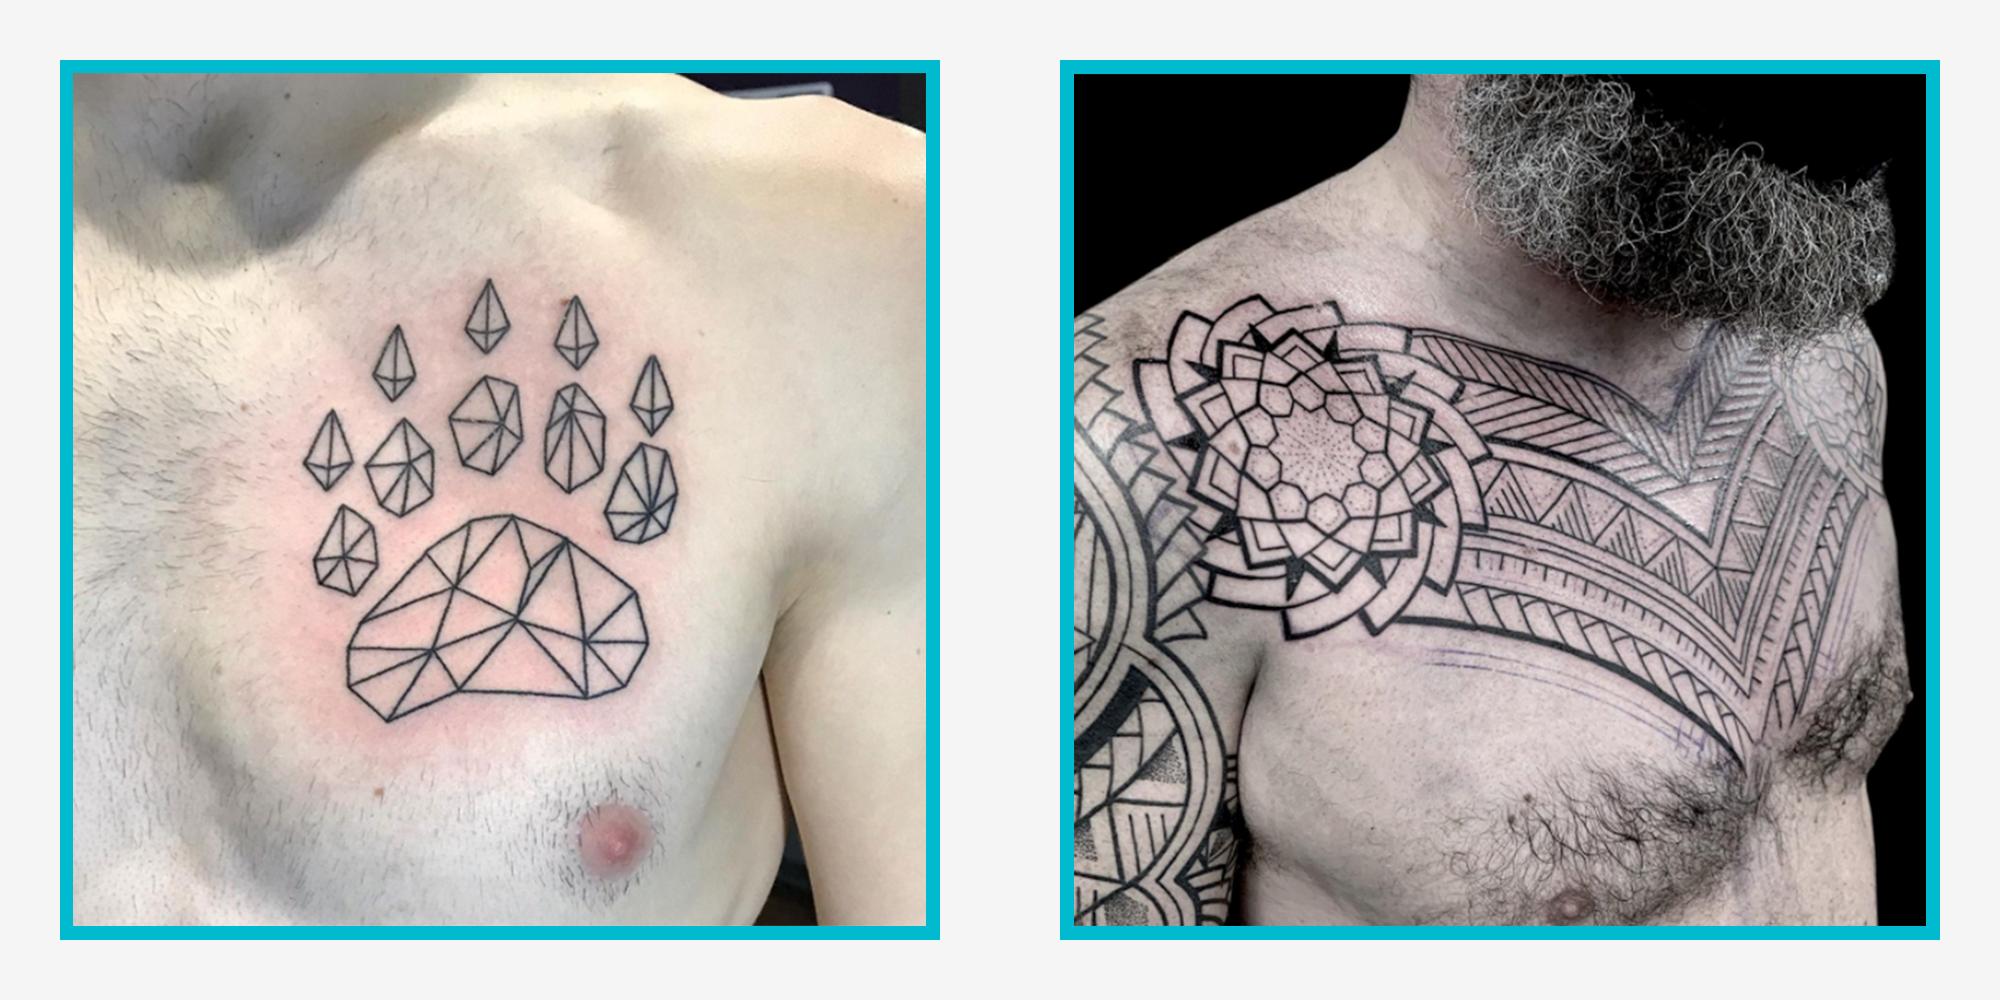 20 Best Chest Tattoo Ideas for Men 20